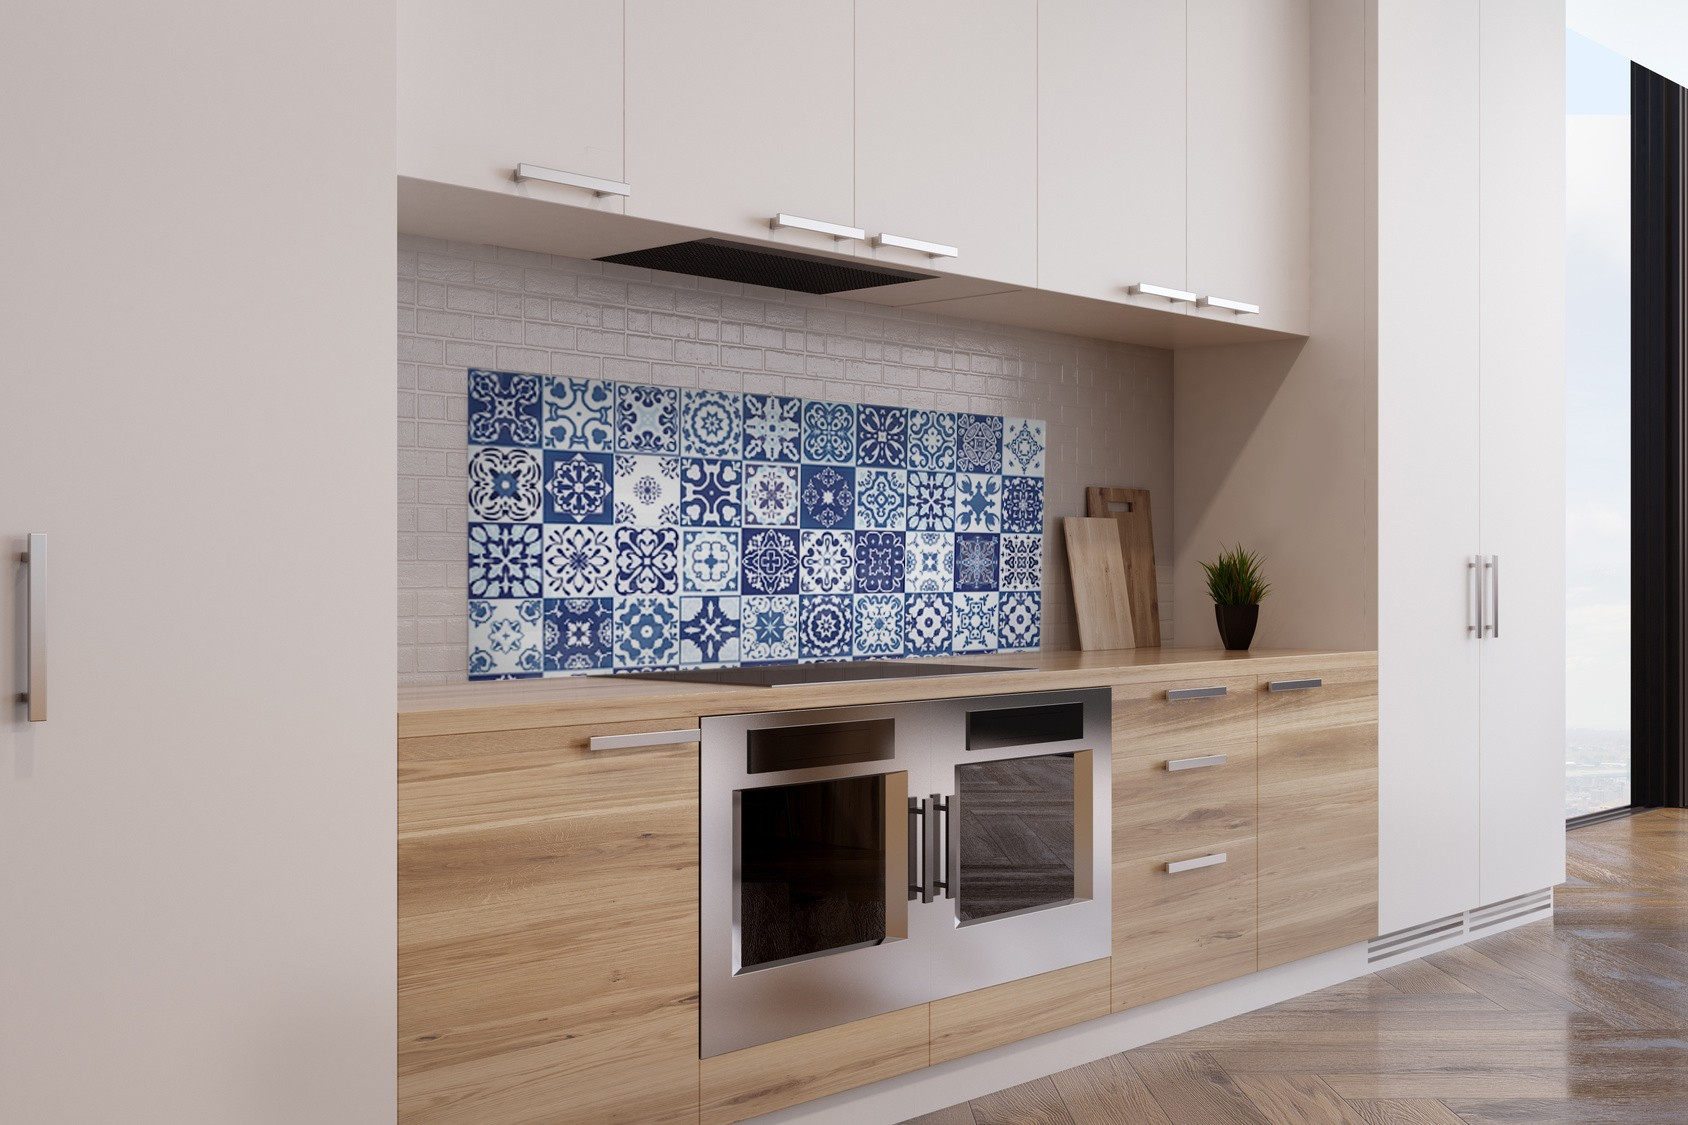 Cr dence effet mosa que bleue verre et alu credence - Mosaique cuisine credence ...